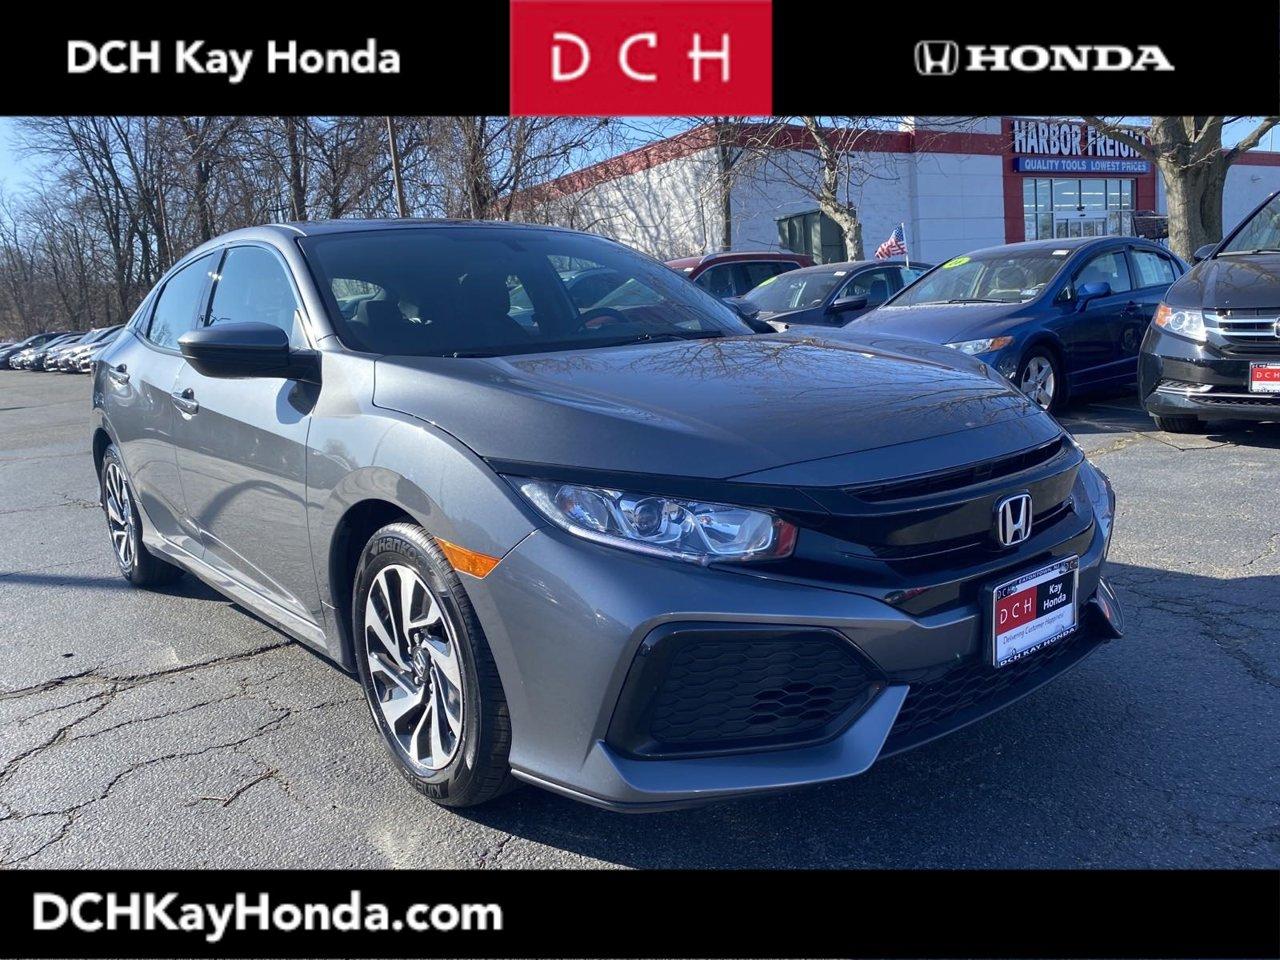 Used 2017 Honda Civic Hatchback in Eatontown, NJ